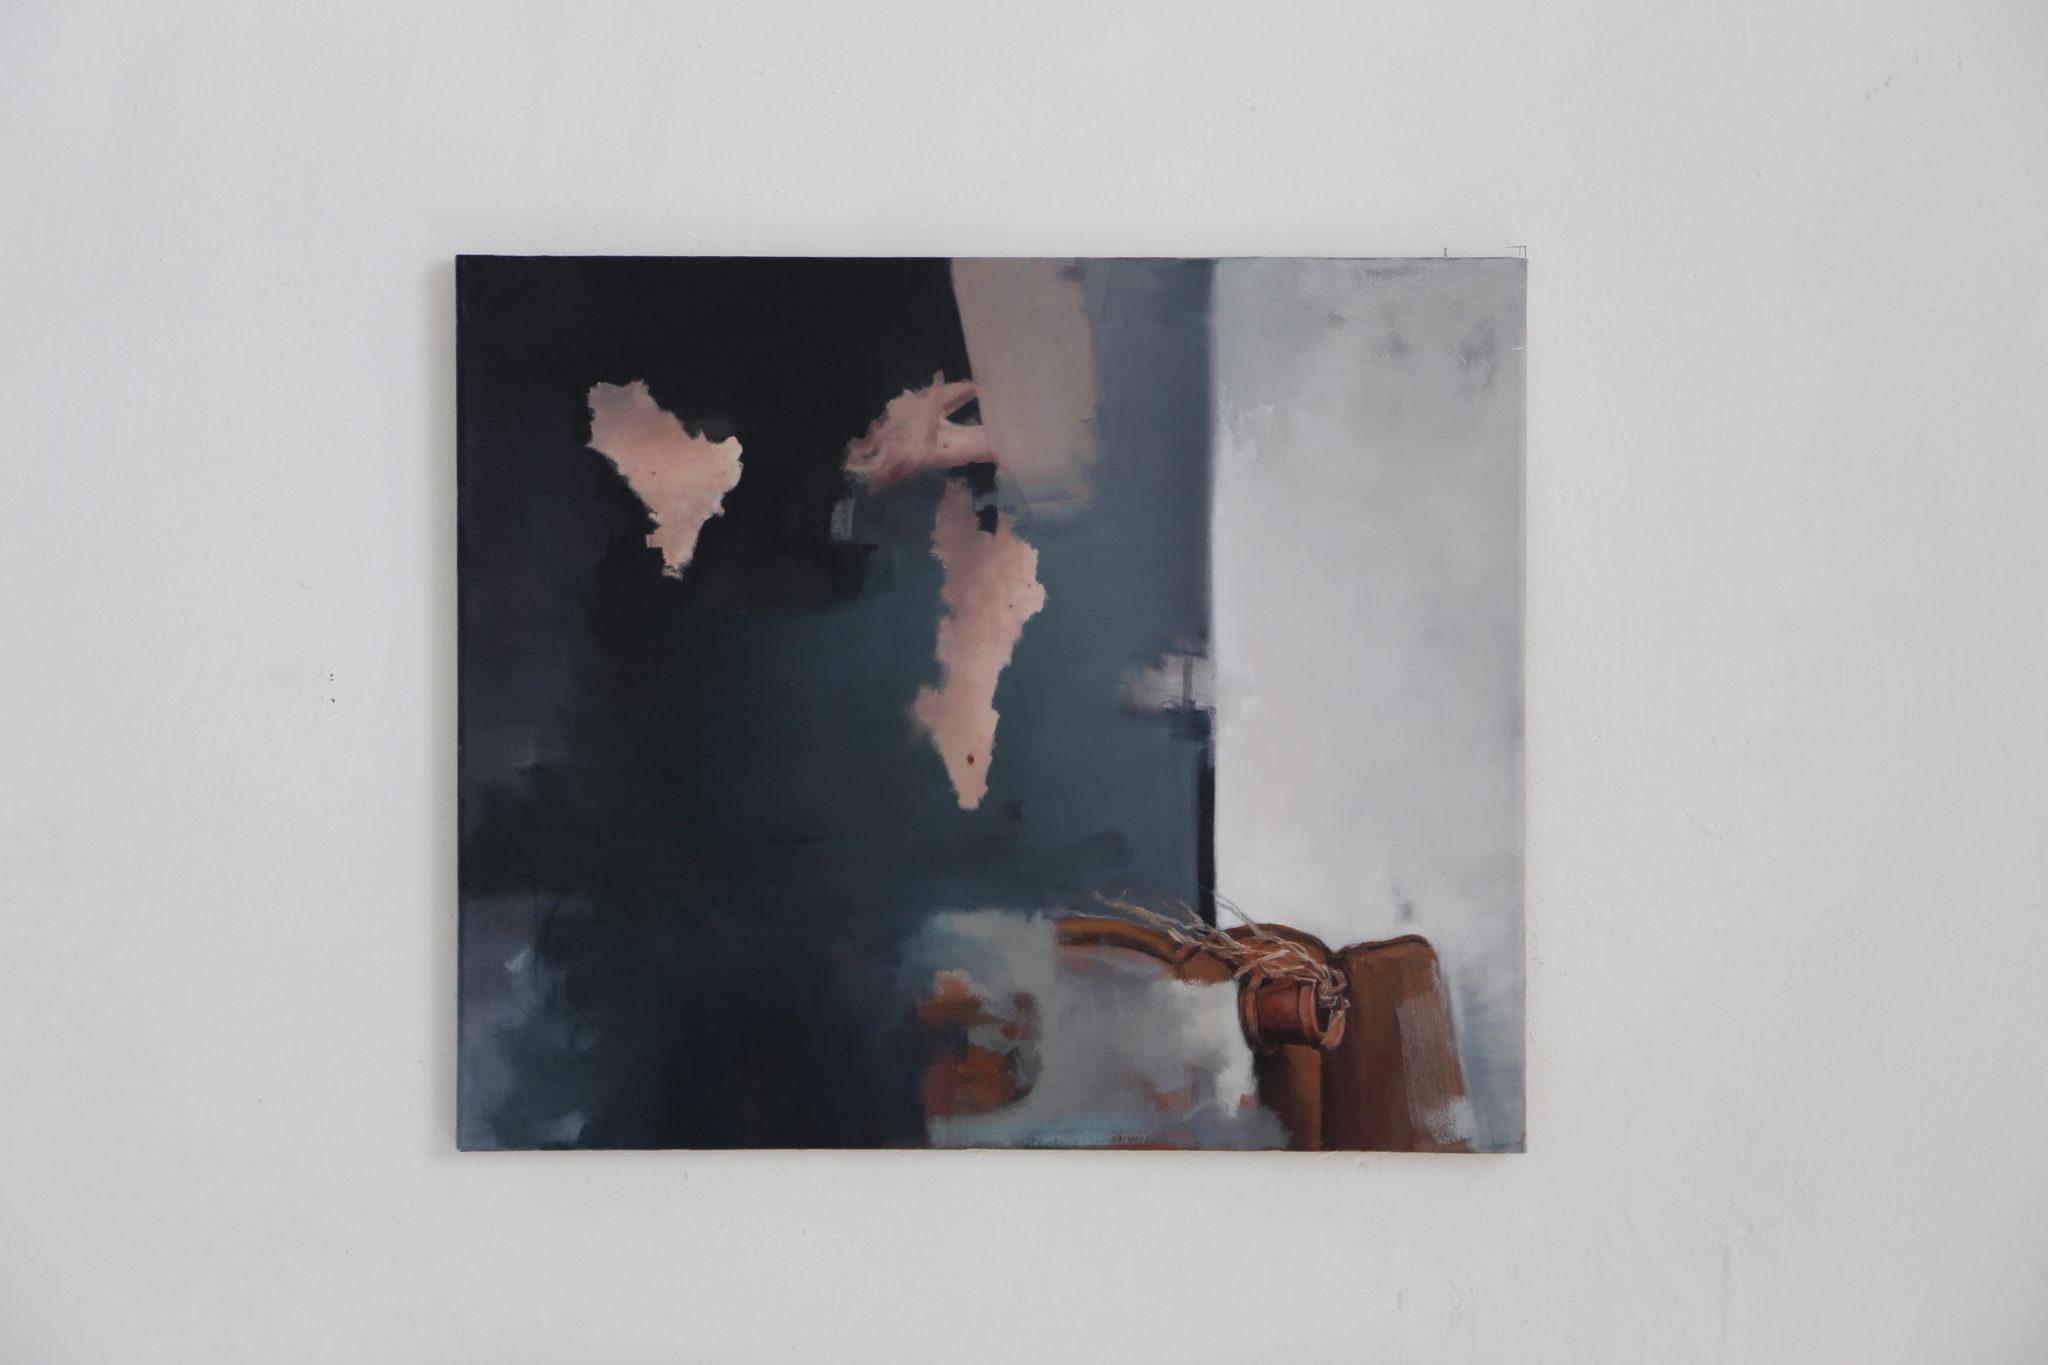 Felix Lorenz, Ohne Titel (Bild 1), Öl auf Leinwand, 60x50, 2020